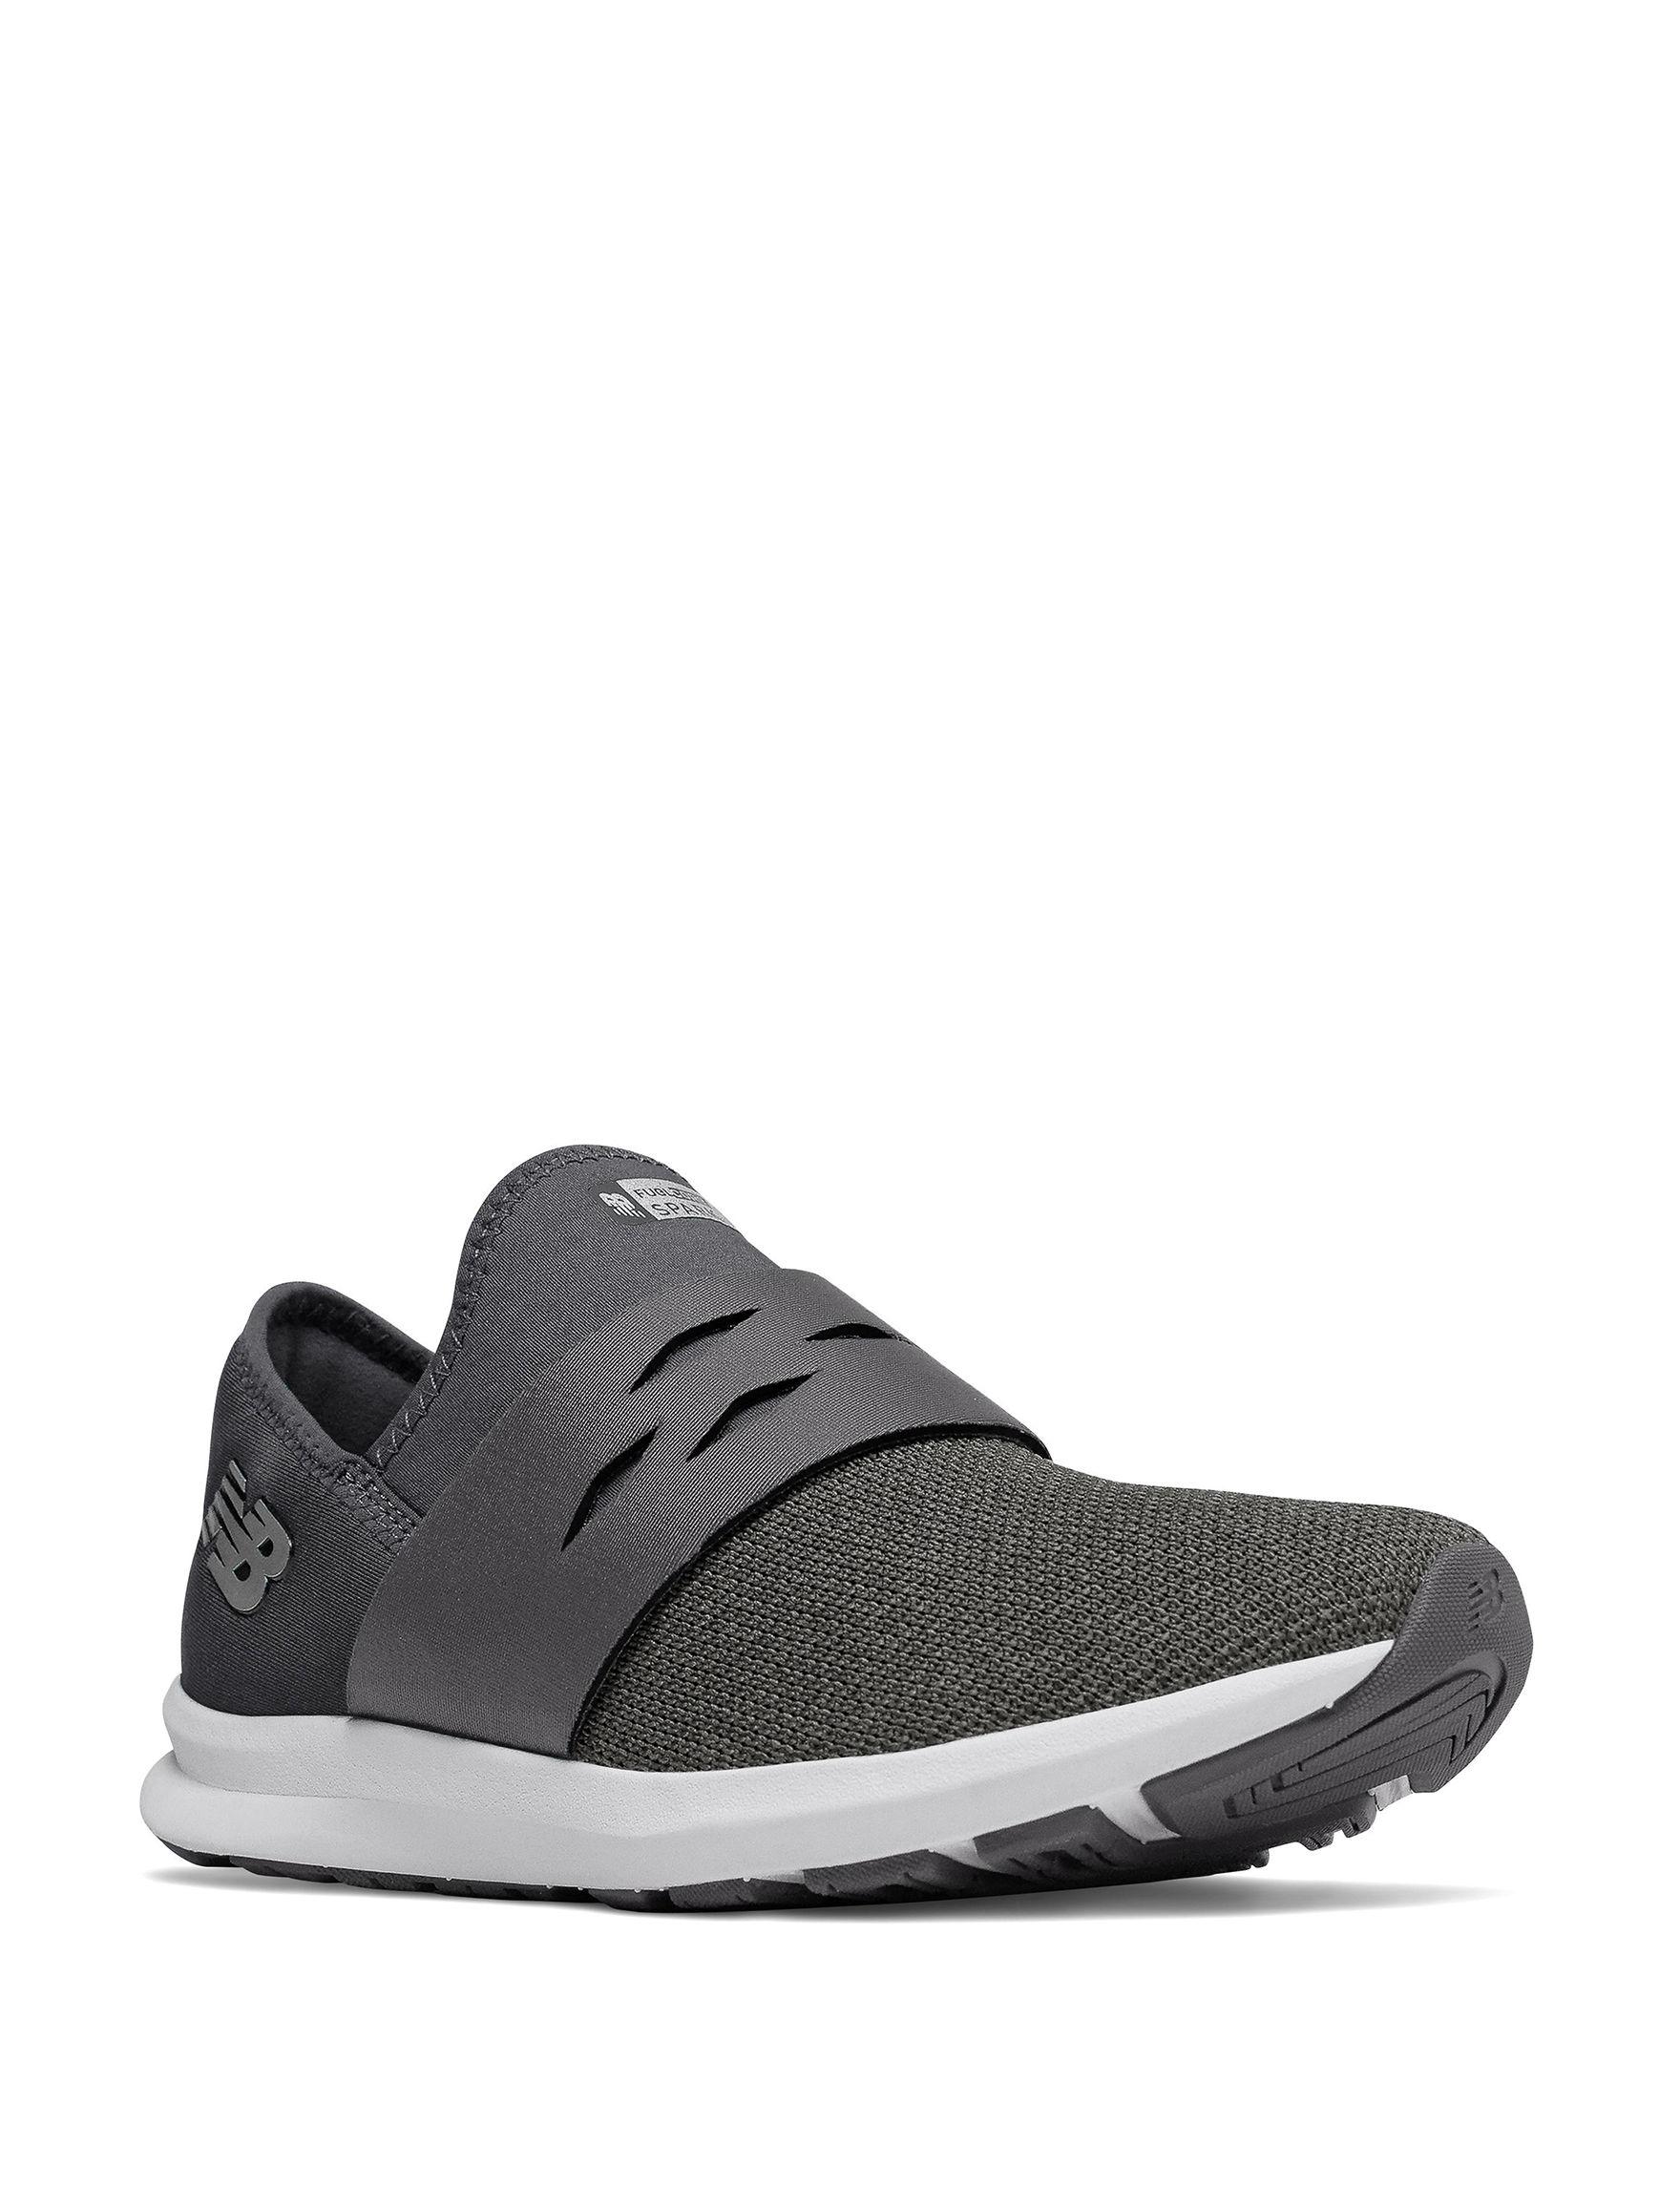 New Balance Grey Comfort Shoes